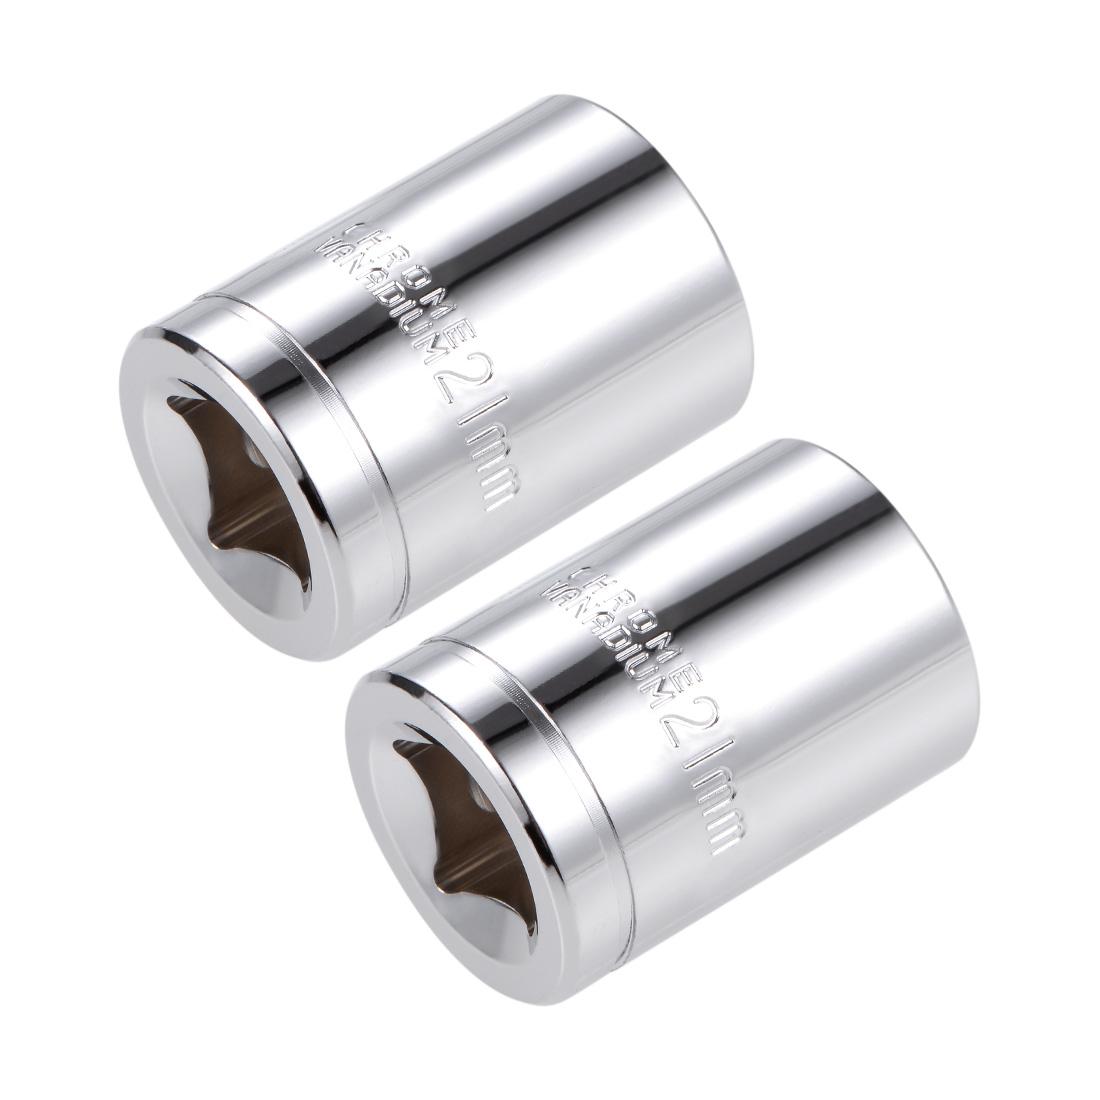 1/2-inch Drive E21 Universal Spline Socket Shallow 12 Point Cr-V Steel 2pcs